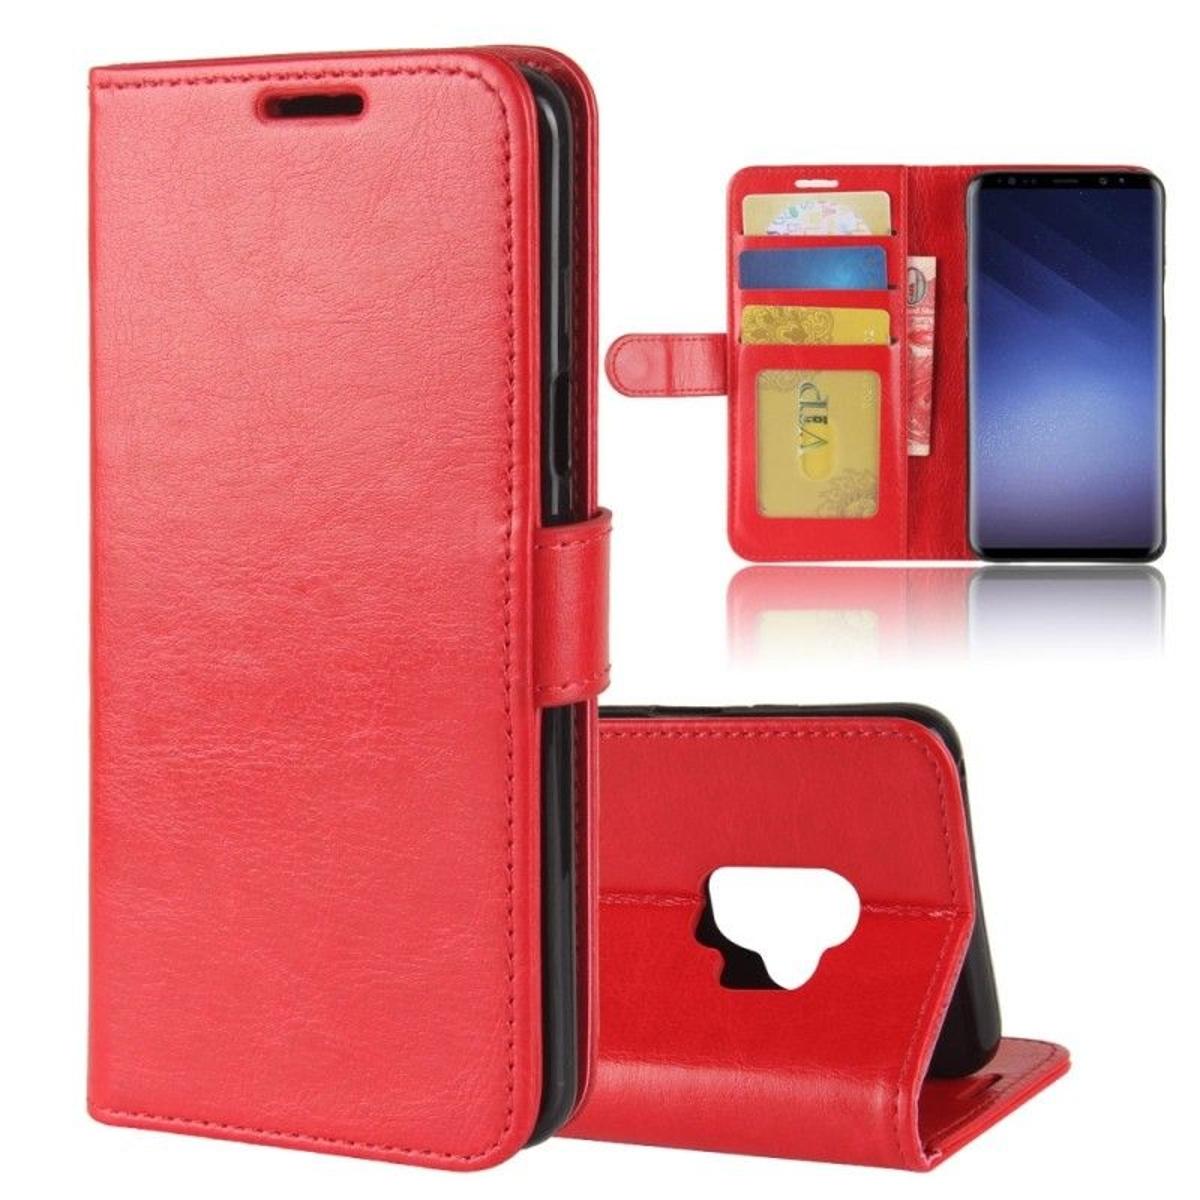 Etui Galaxy S9 Portefeuille Rouge - Crazy Kase